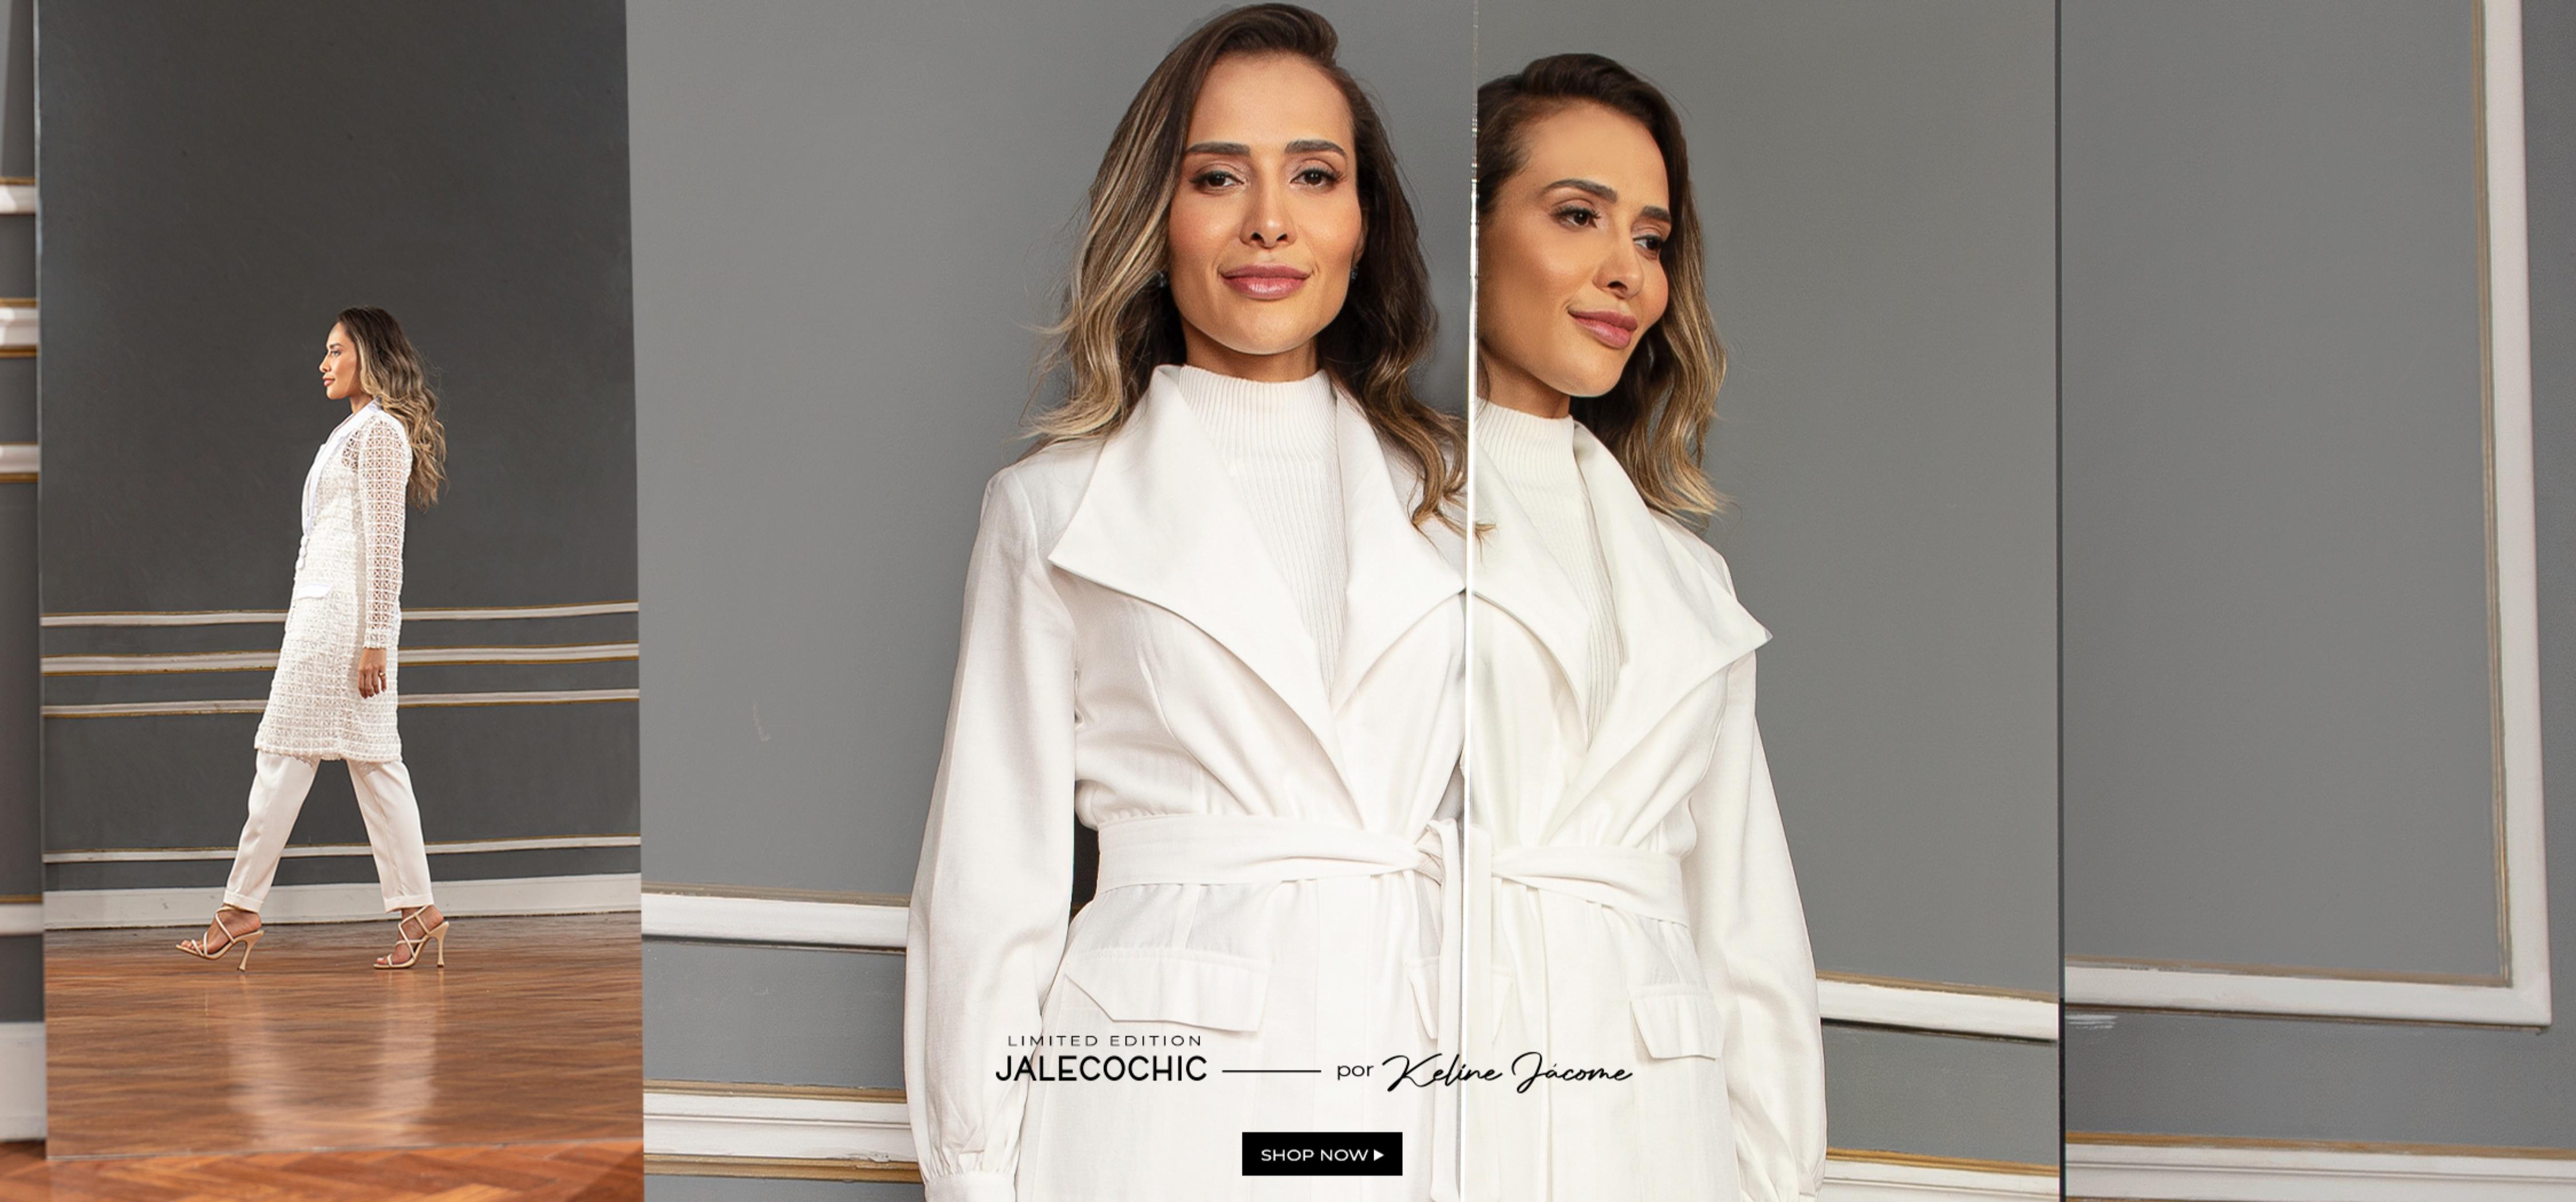 https://www.jalecochic.com.br/jalecos-keline-jacome